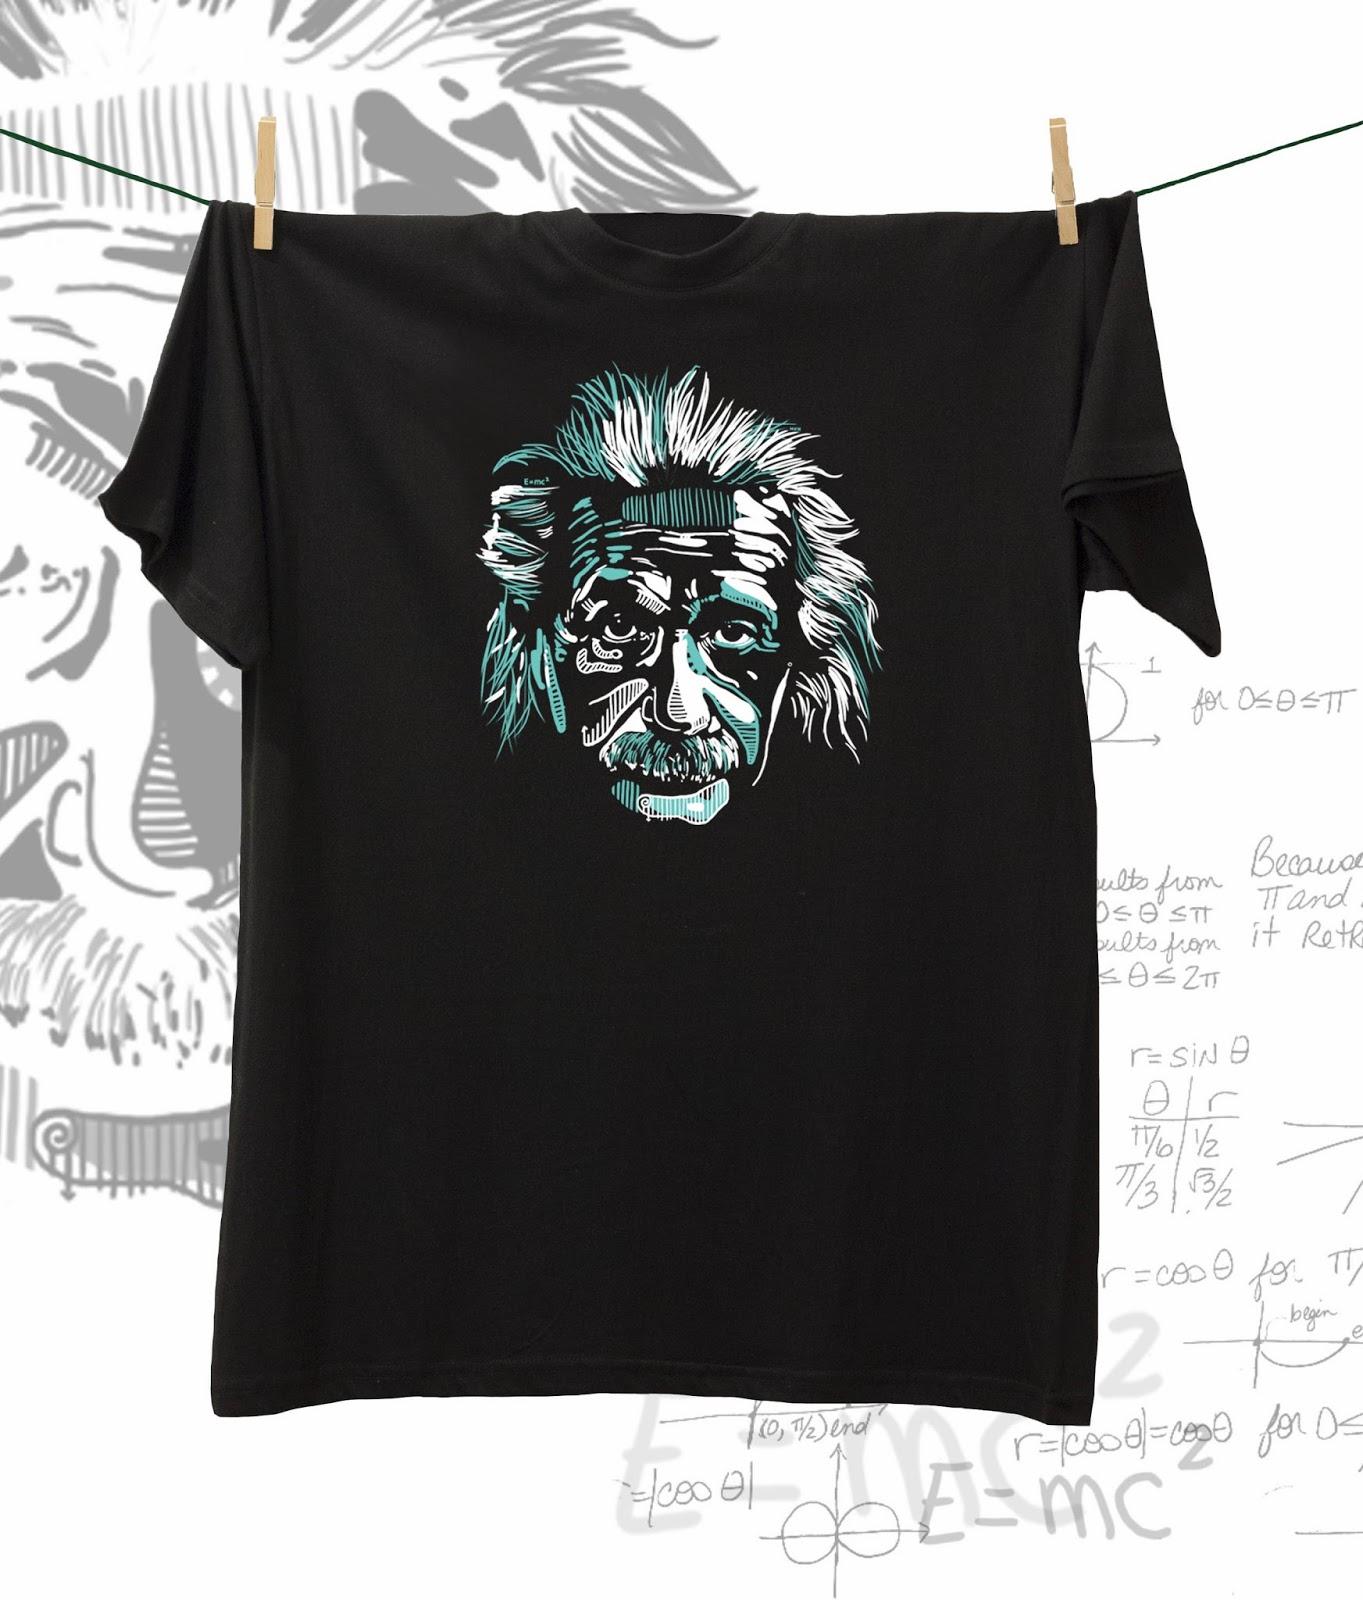 http://www.mangaxhombroshop.com/inicio/camisetas-chico/camiseta-a-einstein/